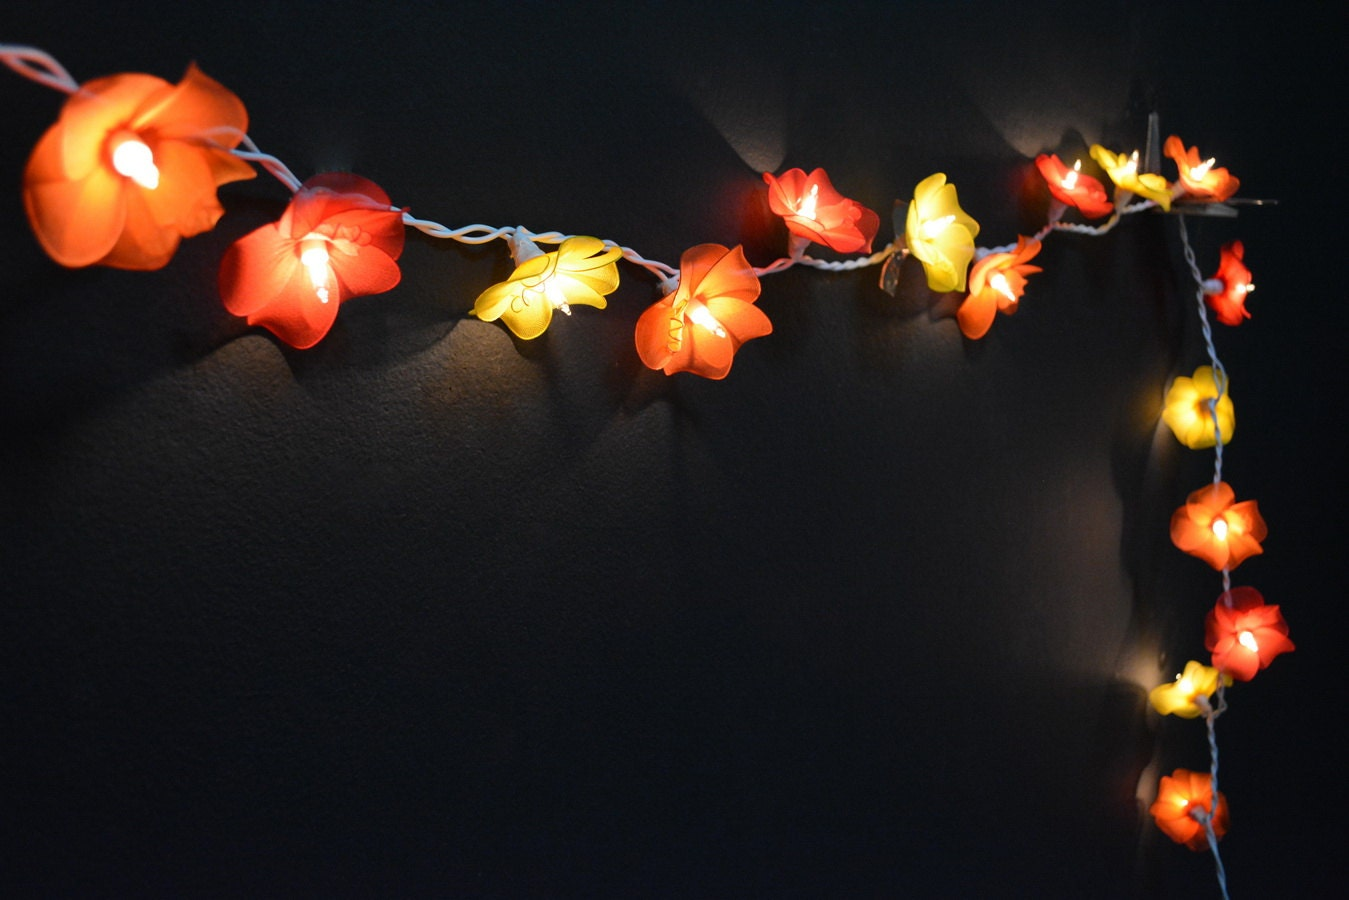 Flower String Lights Nz : 20 Lights Orange Tone Orchid Flowers String Lights by YooCotton